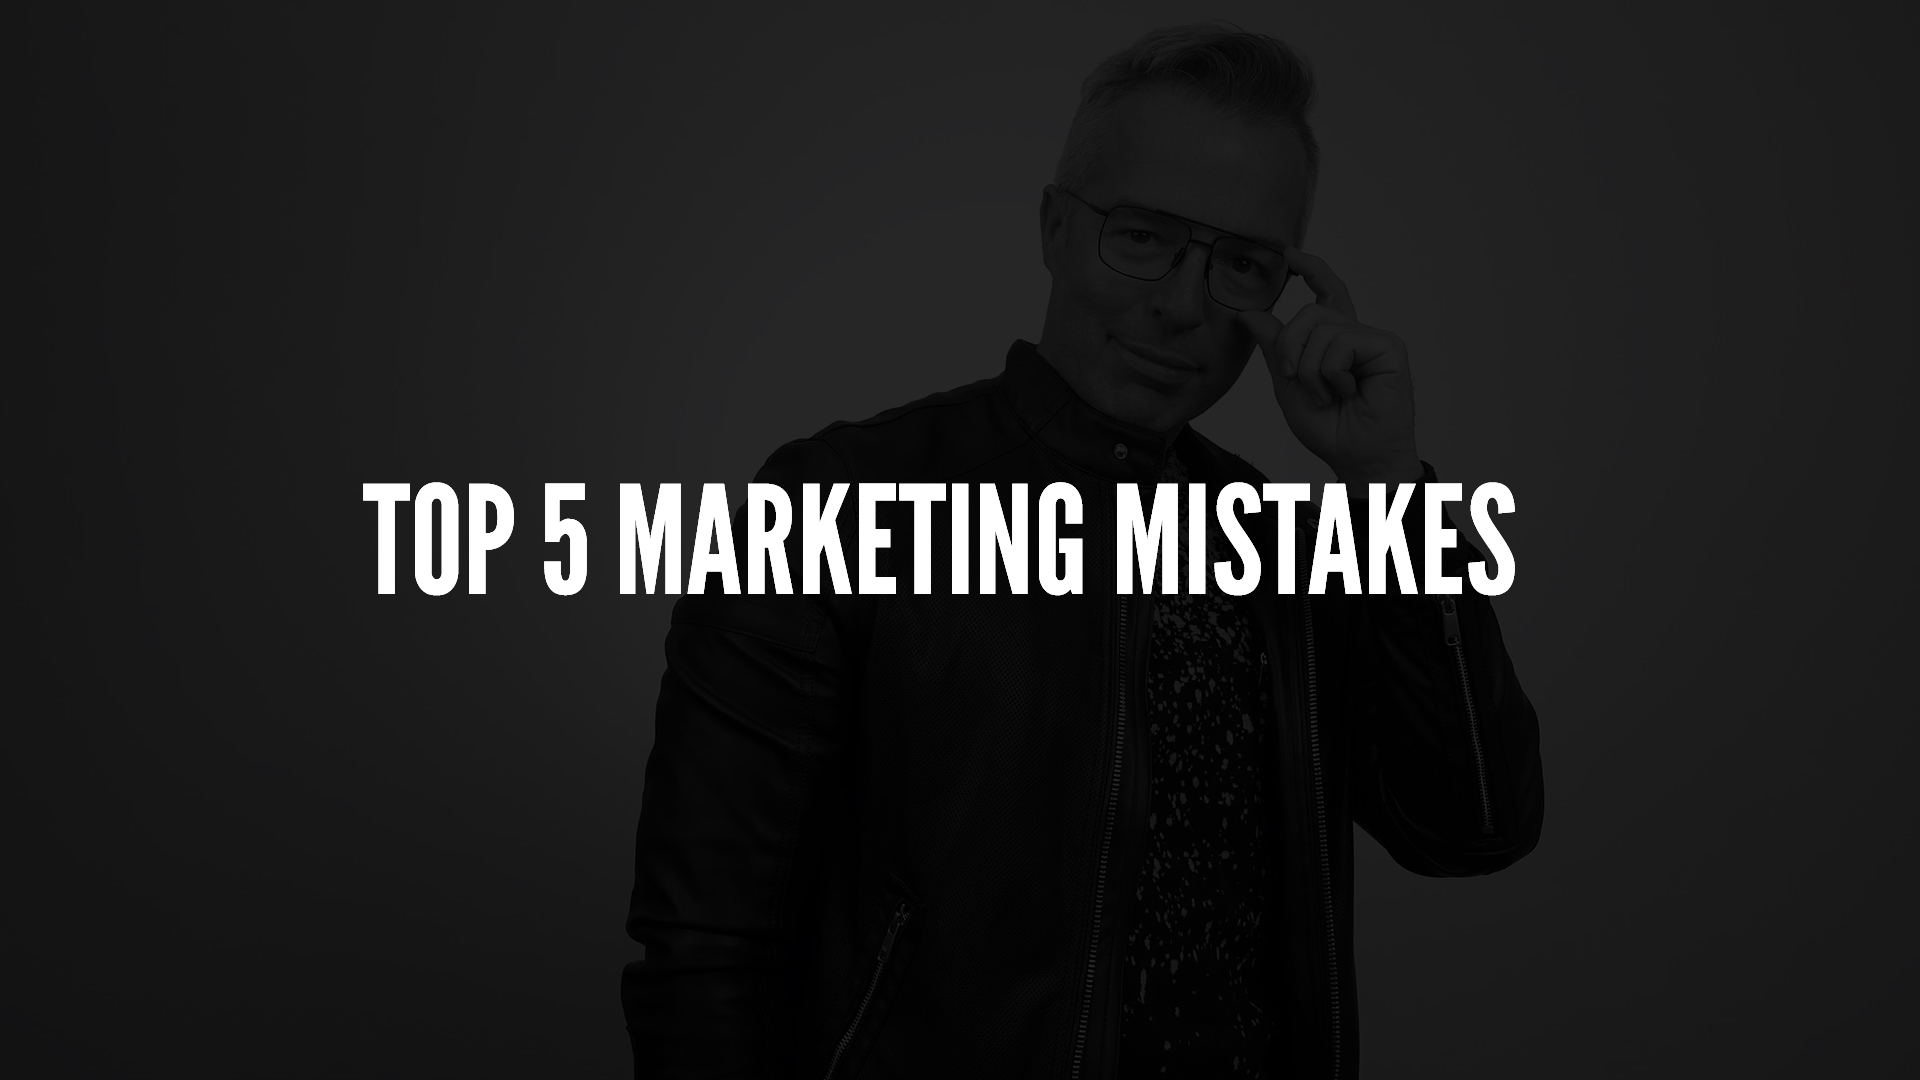 Top 5 Marketing Mistakes.jpg